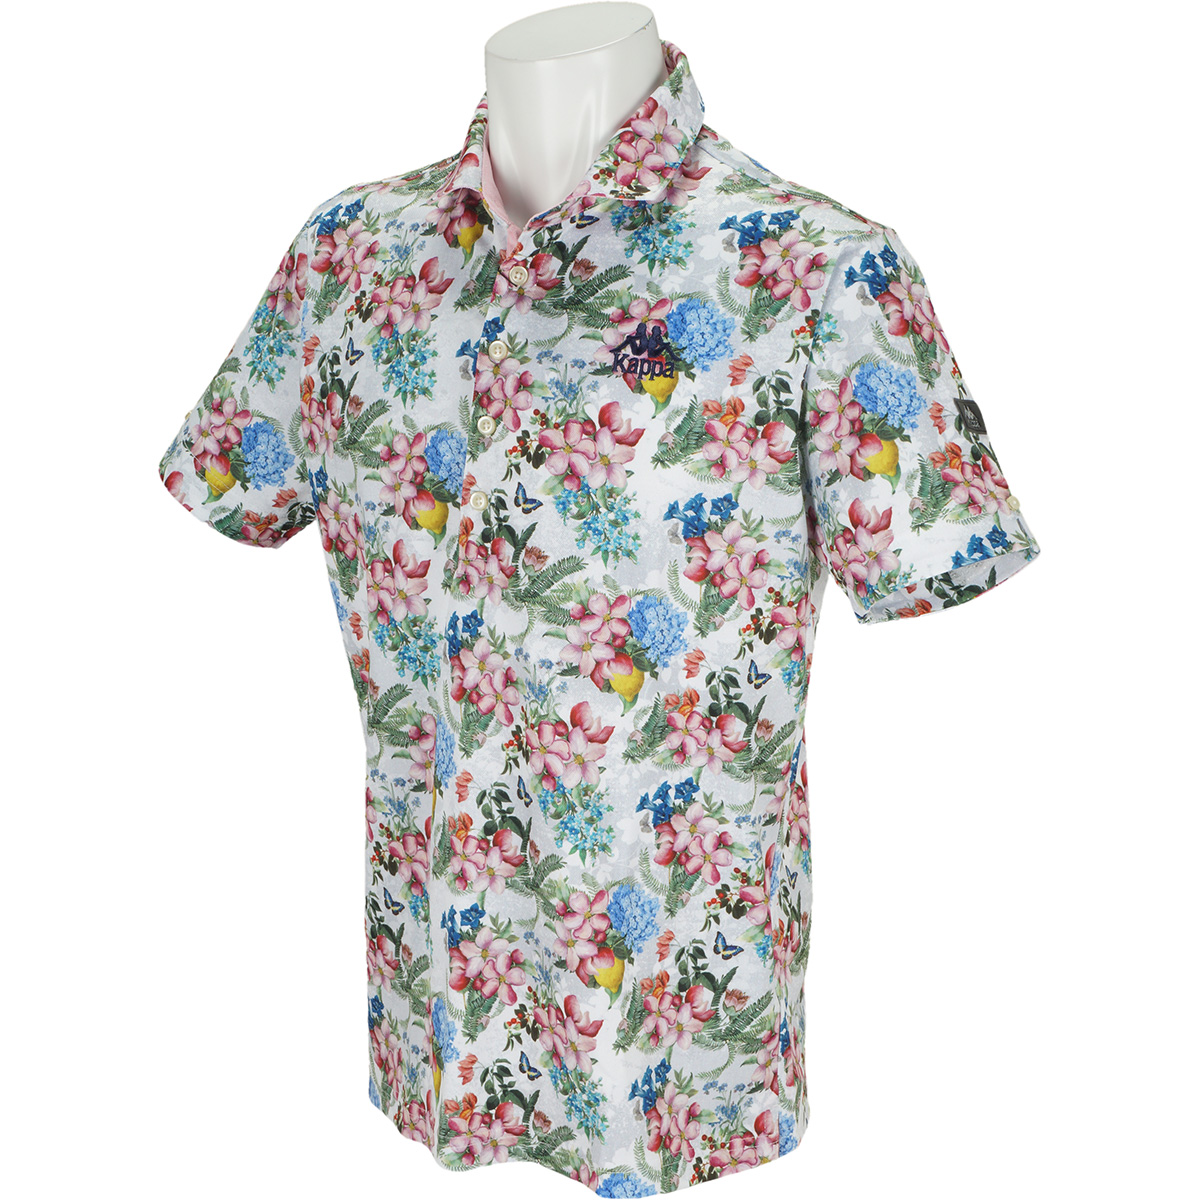 Kappa GOLF 花柄プリントストレッチ半袖ポロシャツ